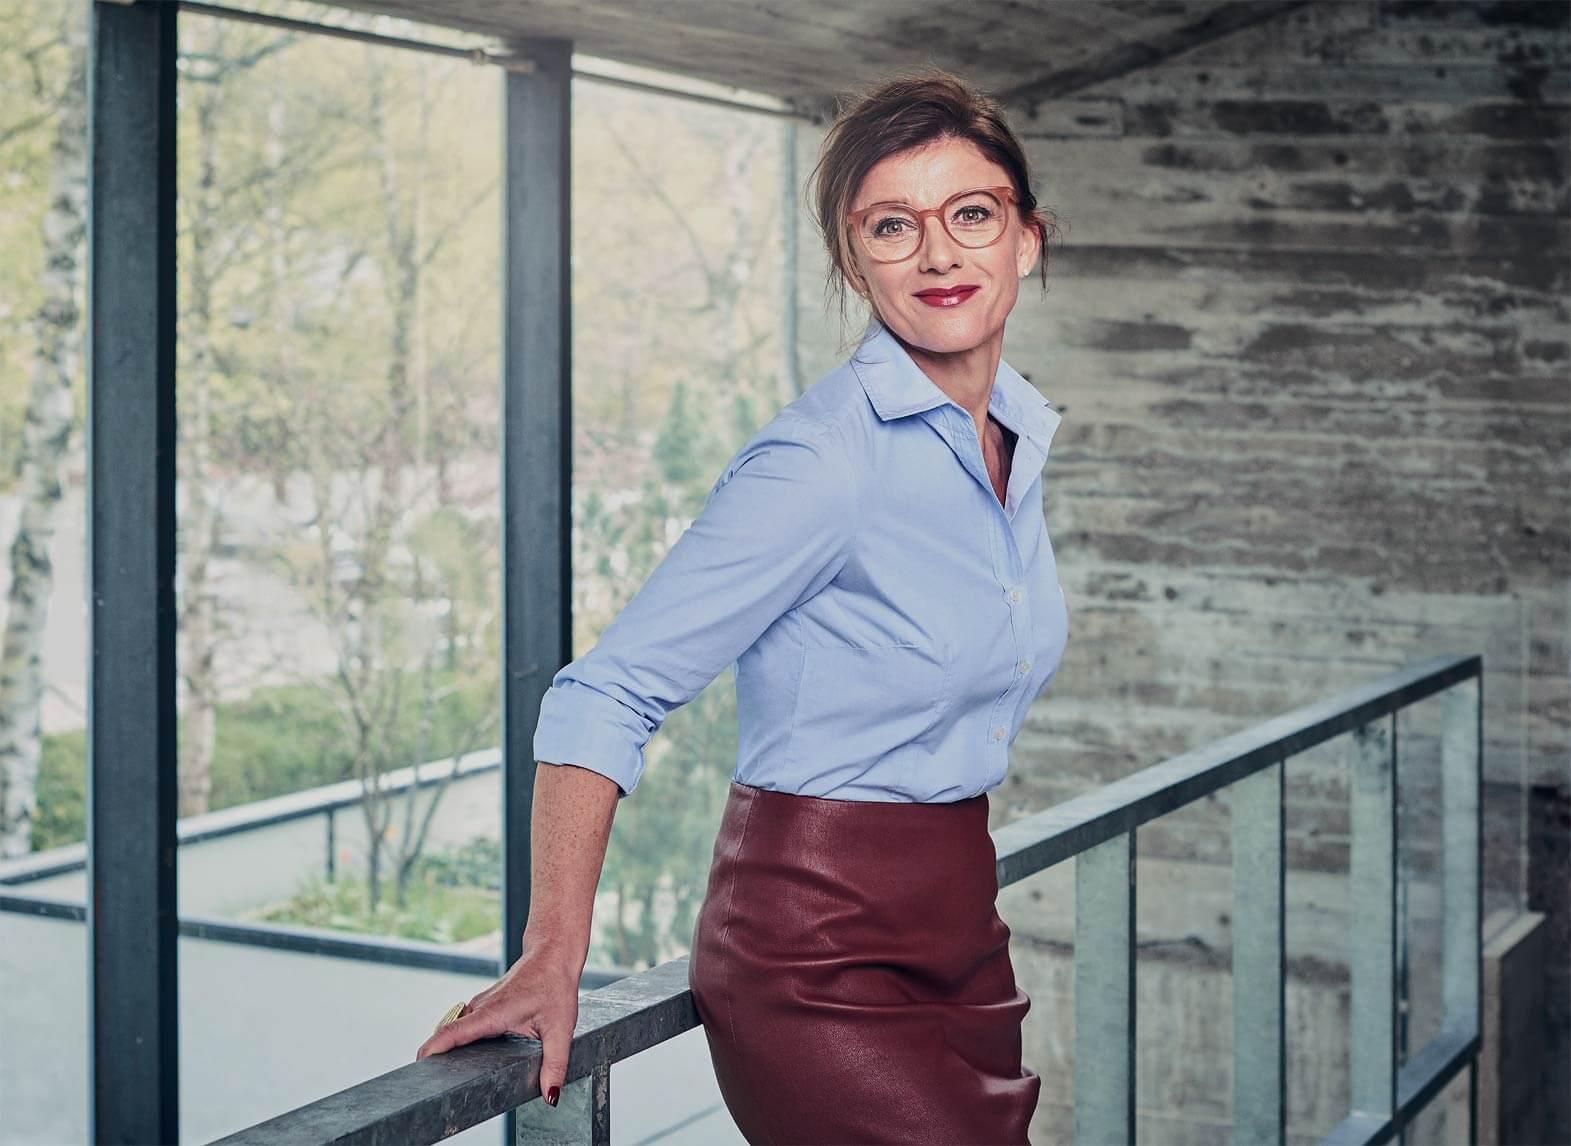 Sabine Hübner - Keynote Speakerin - Rehasport Kongress 2020